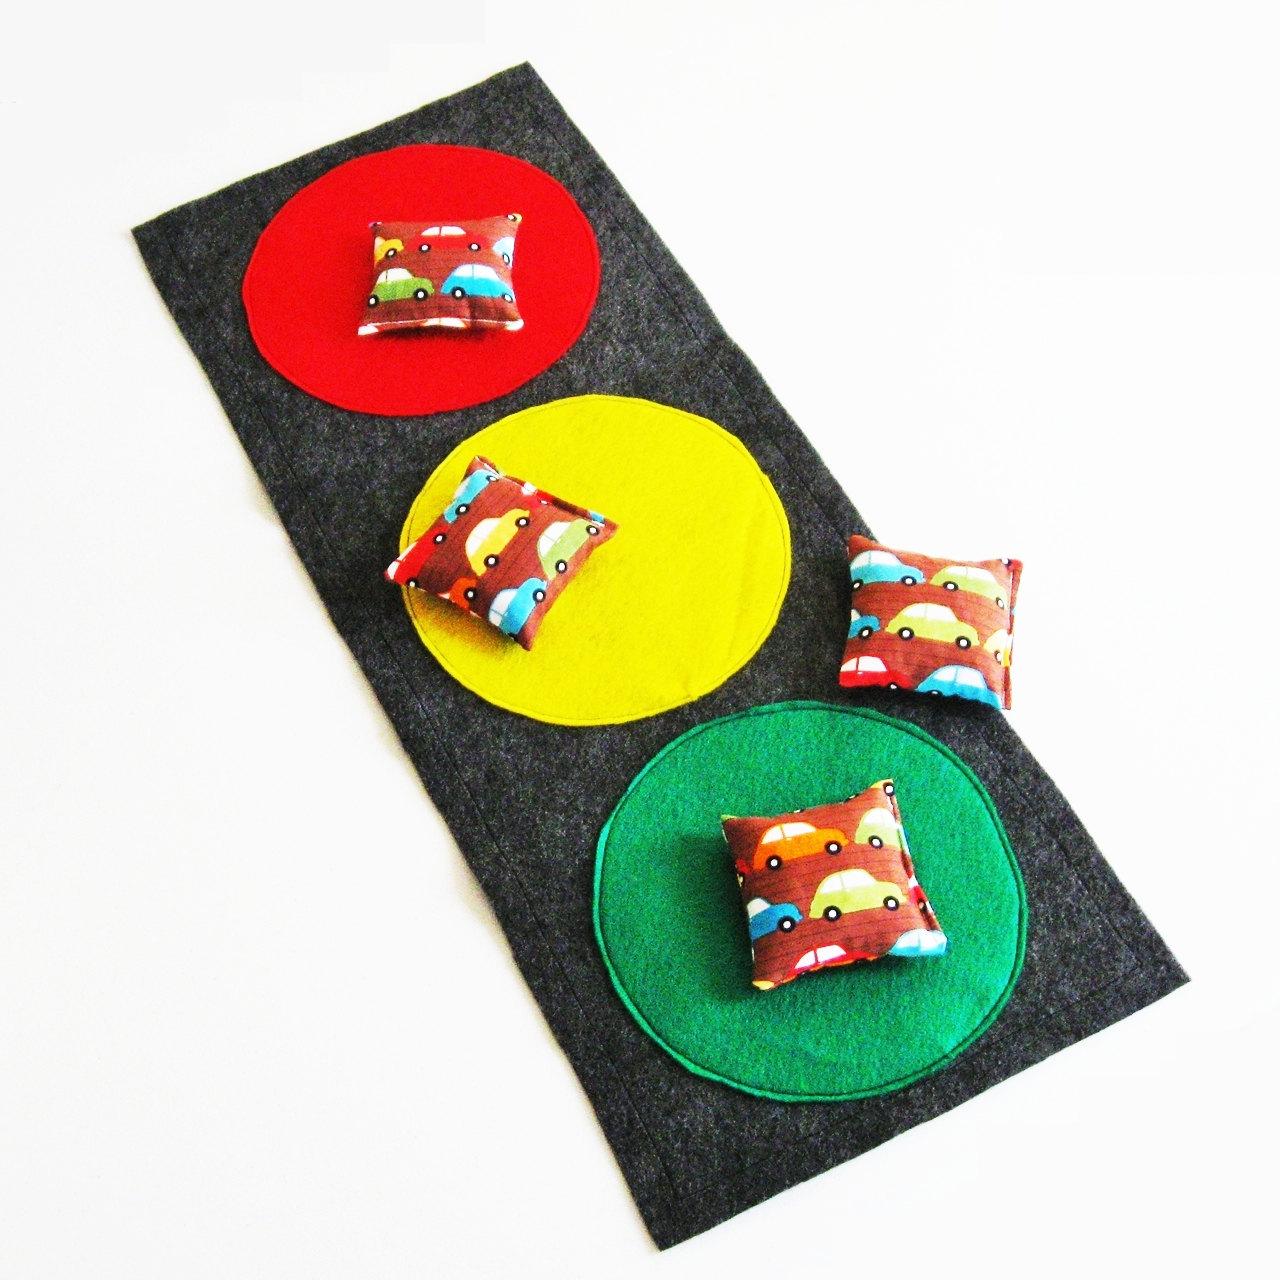 Bag Gloves Images Bean Bag Toss Game